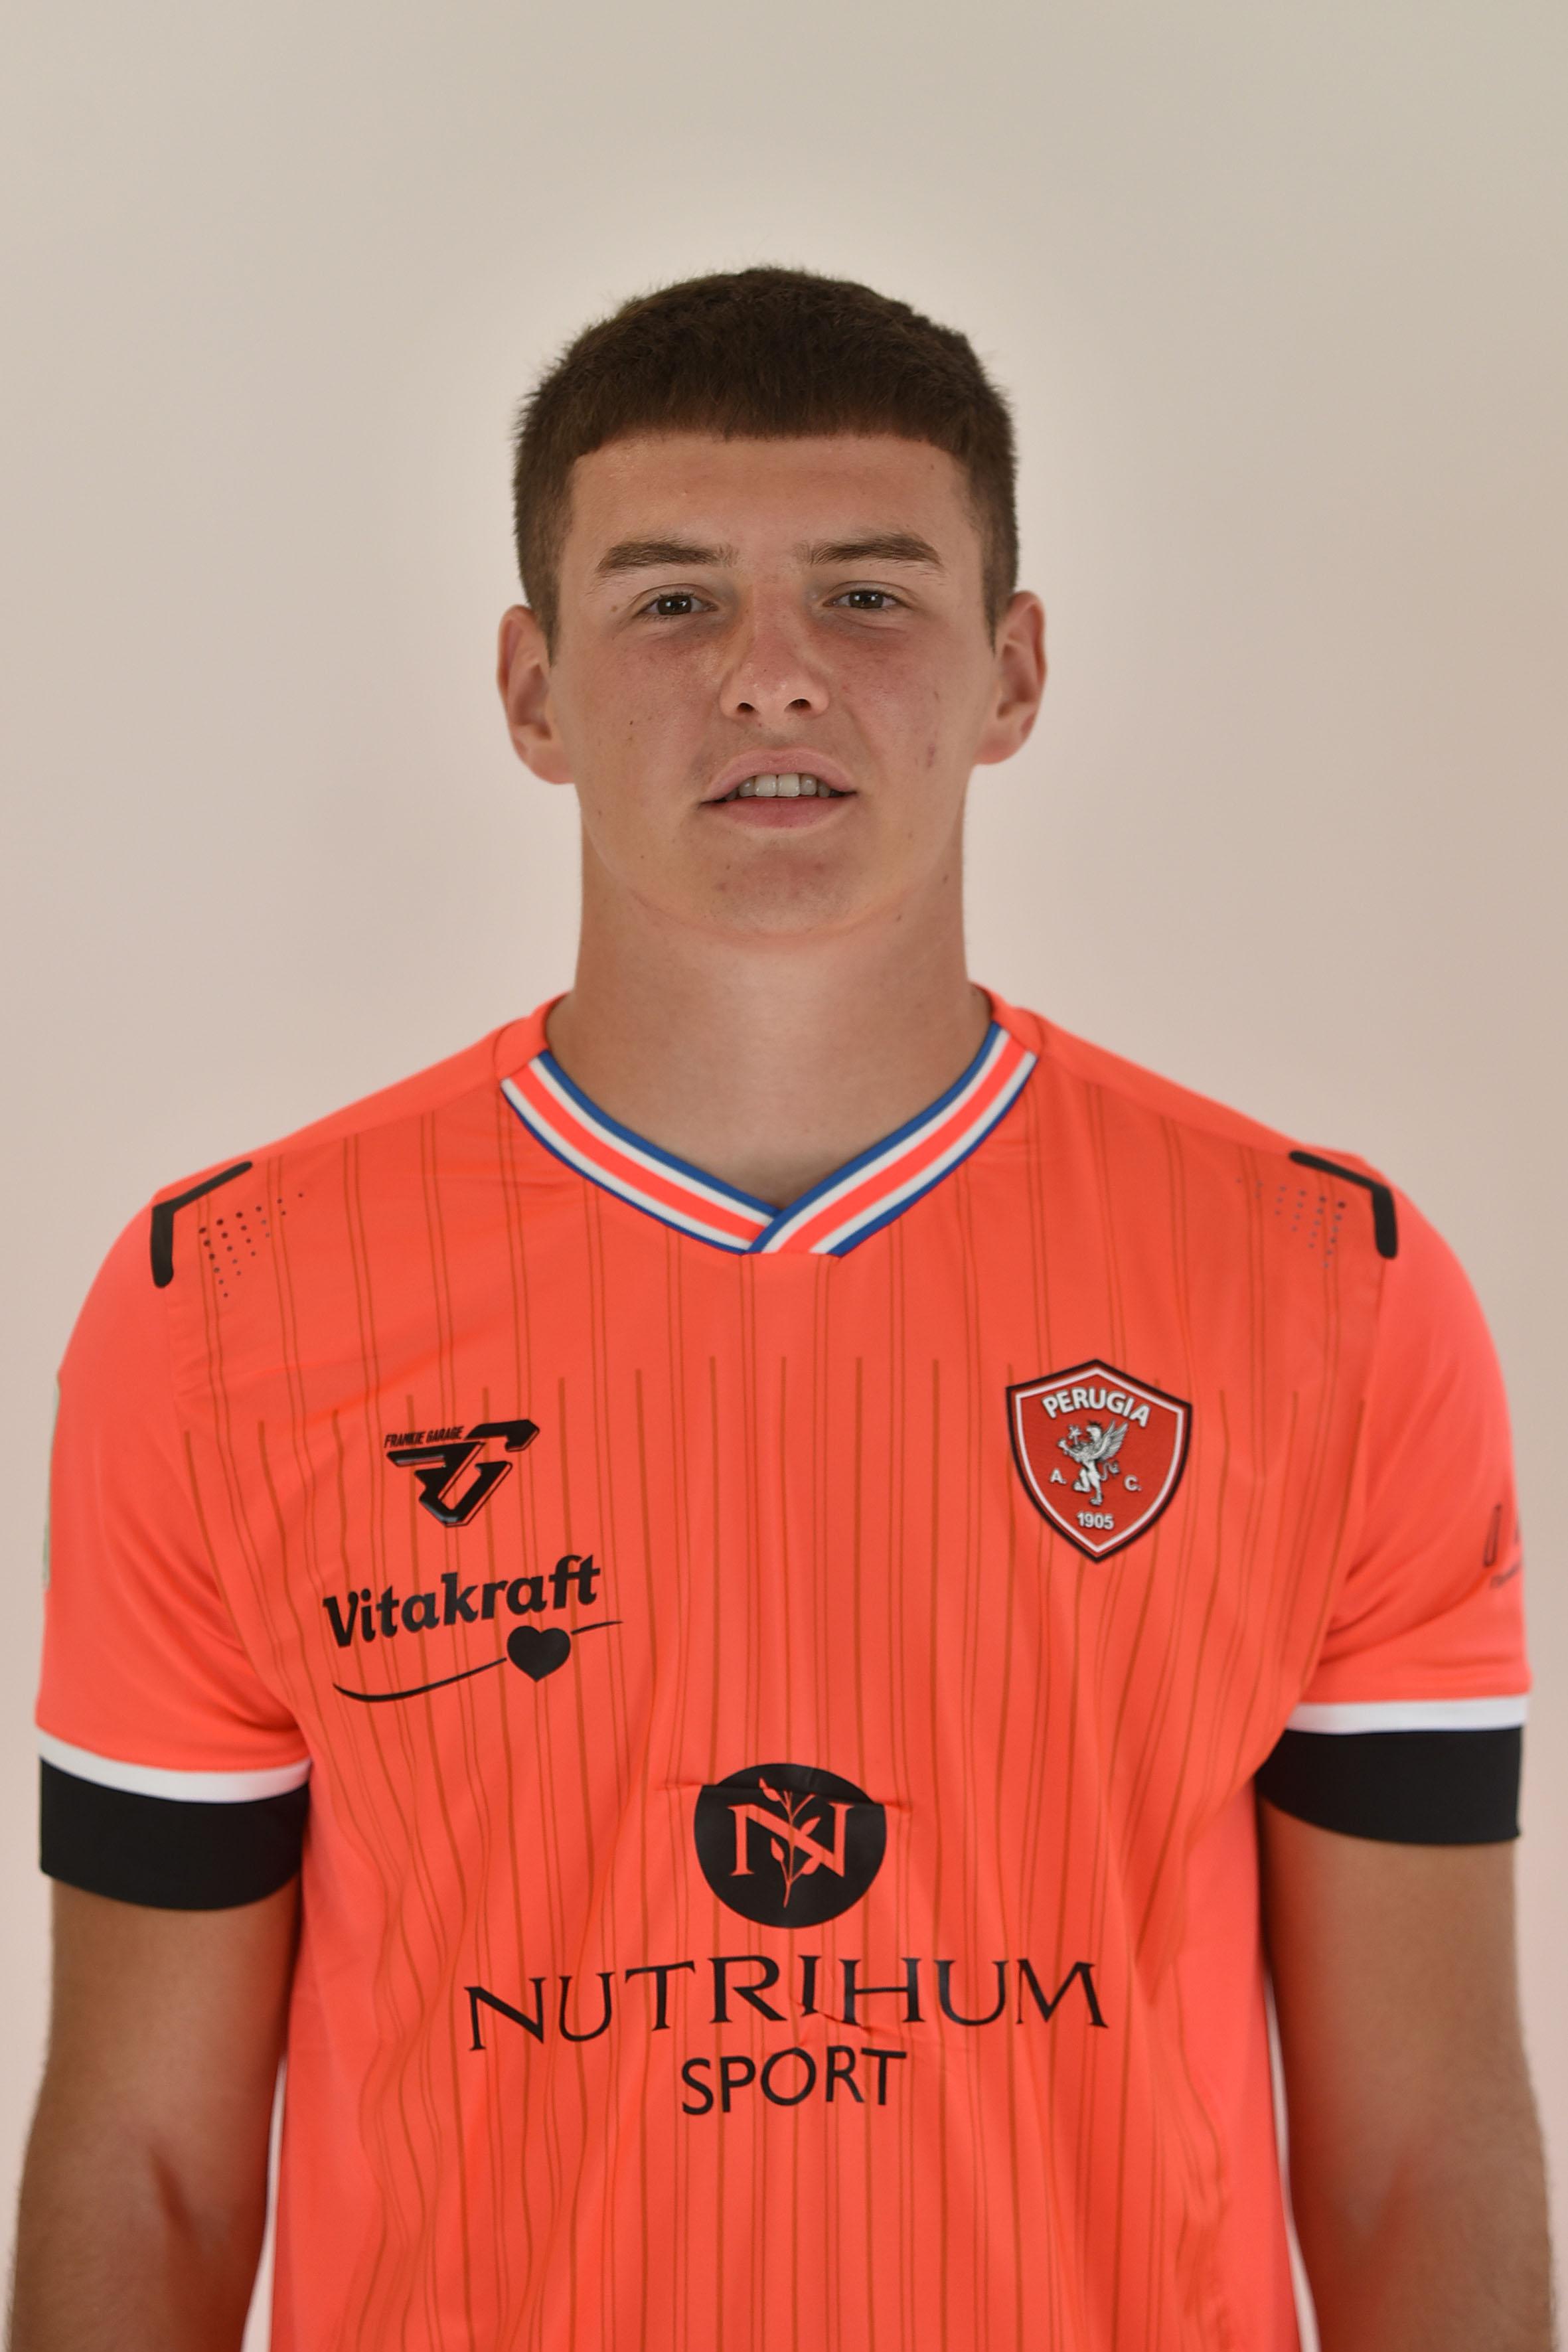 Gábor MegyeriPortiere- A.C. Perugia Calcio